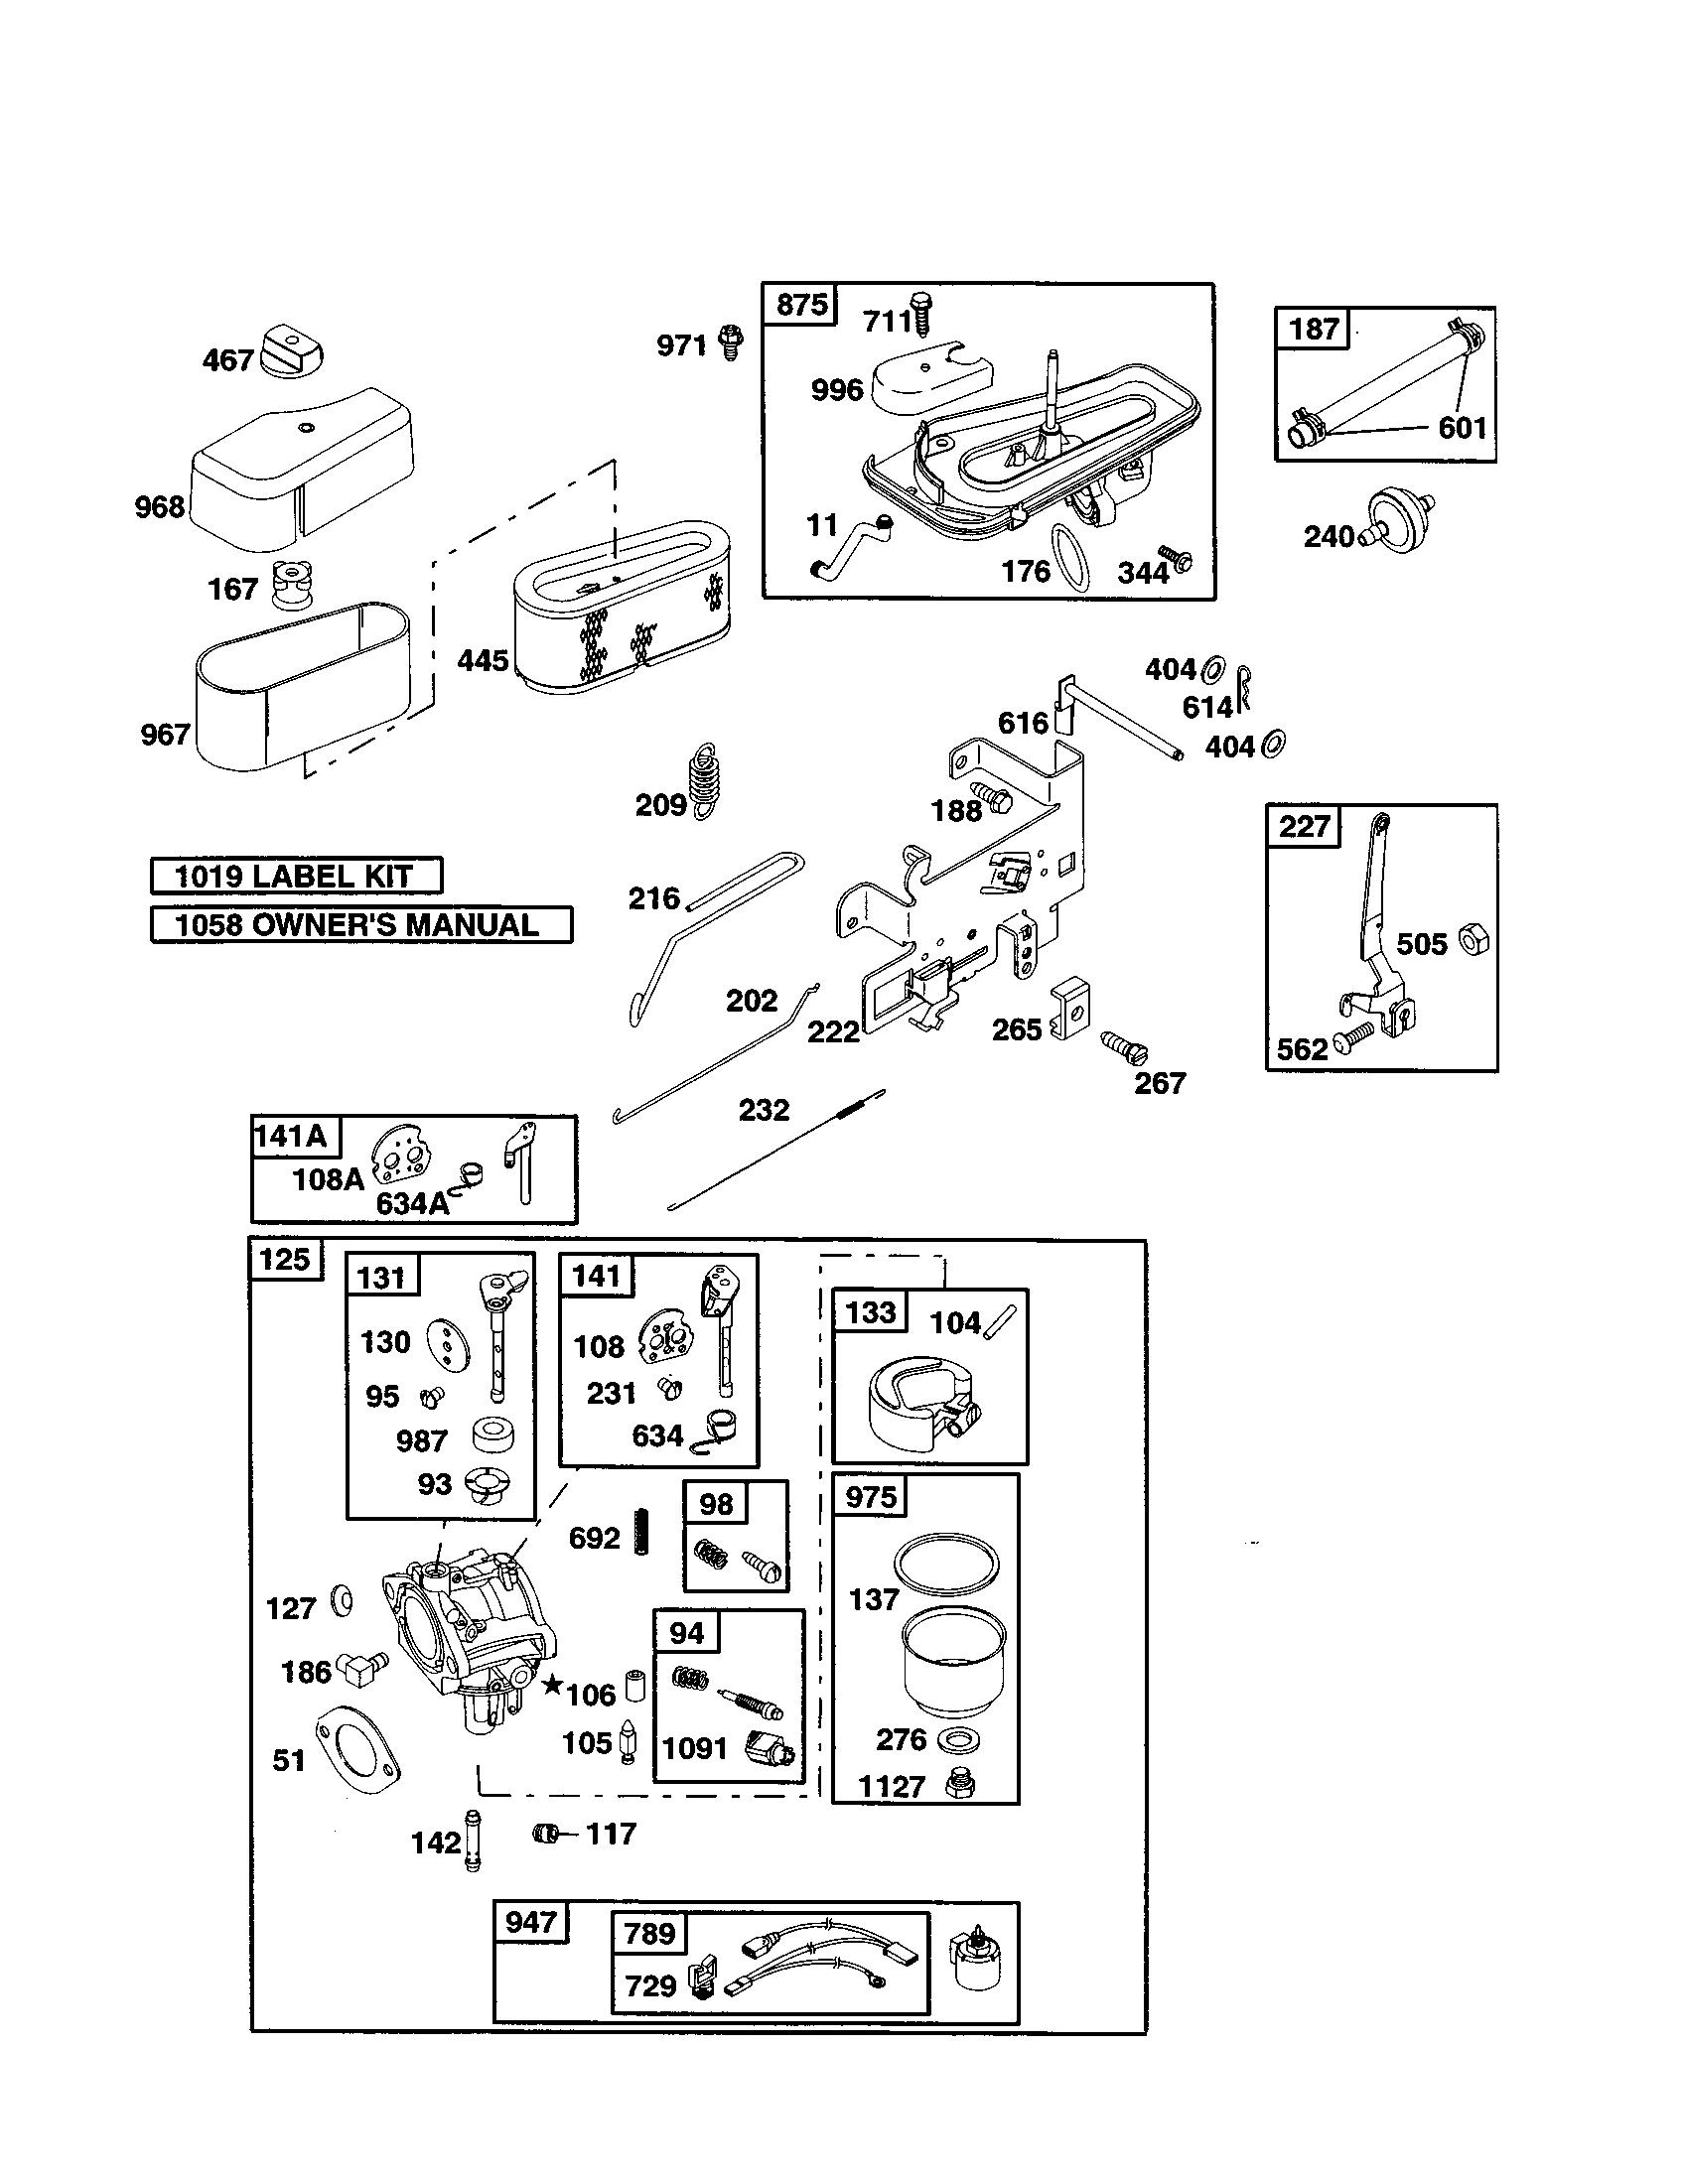 Briggs and stratton engine model 287707 wiring diagram wiring